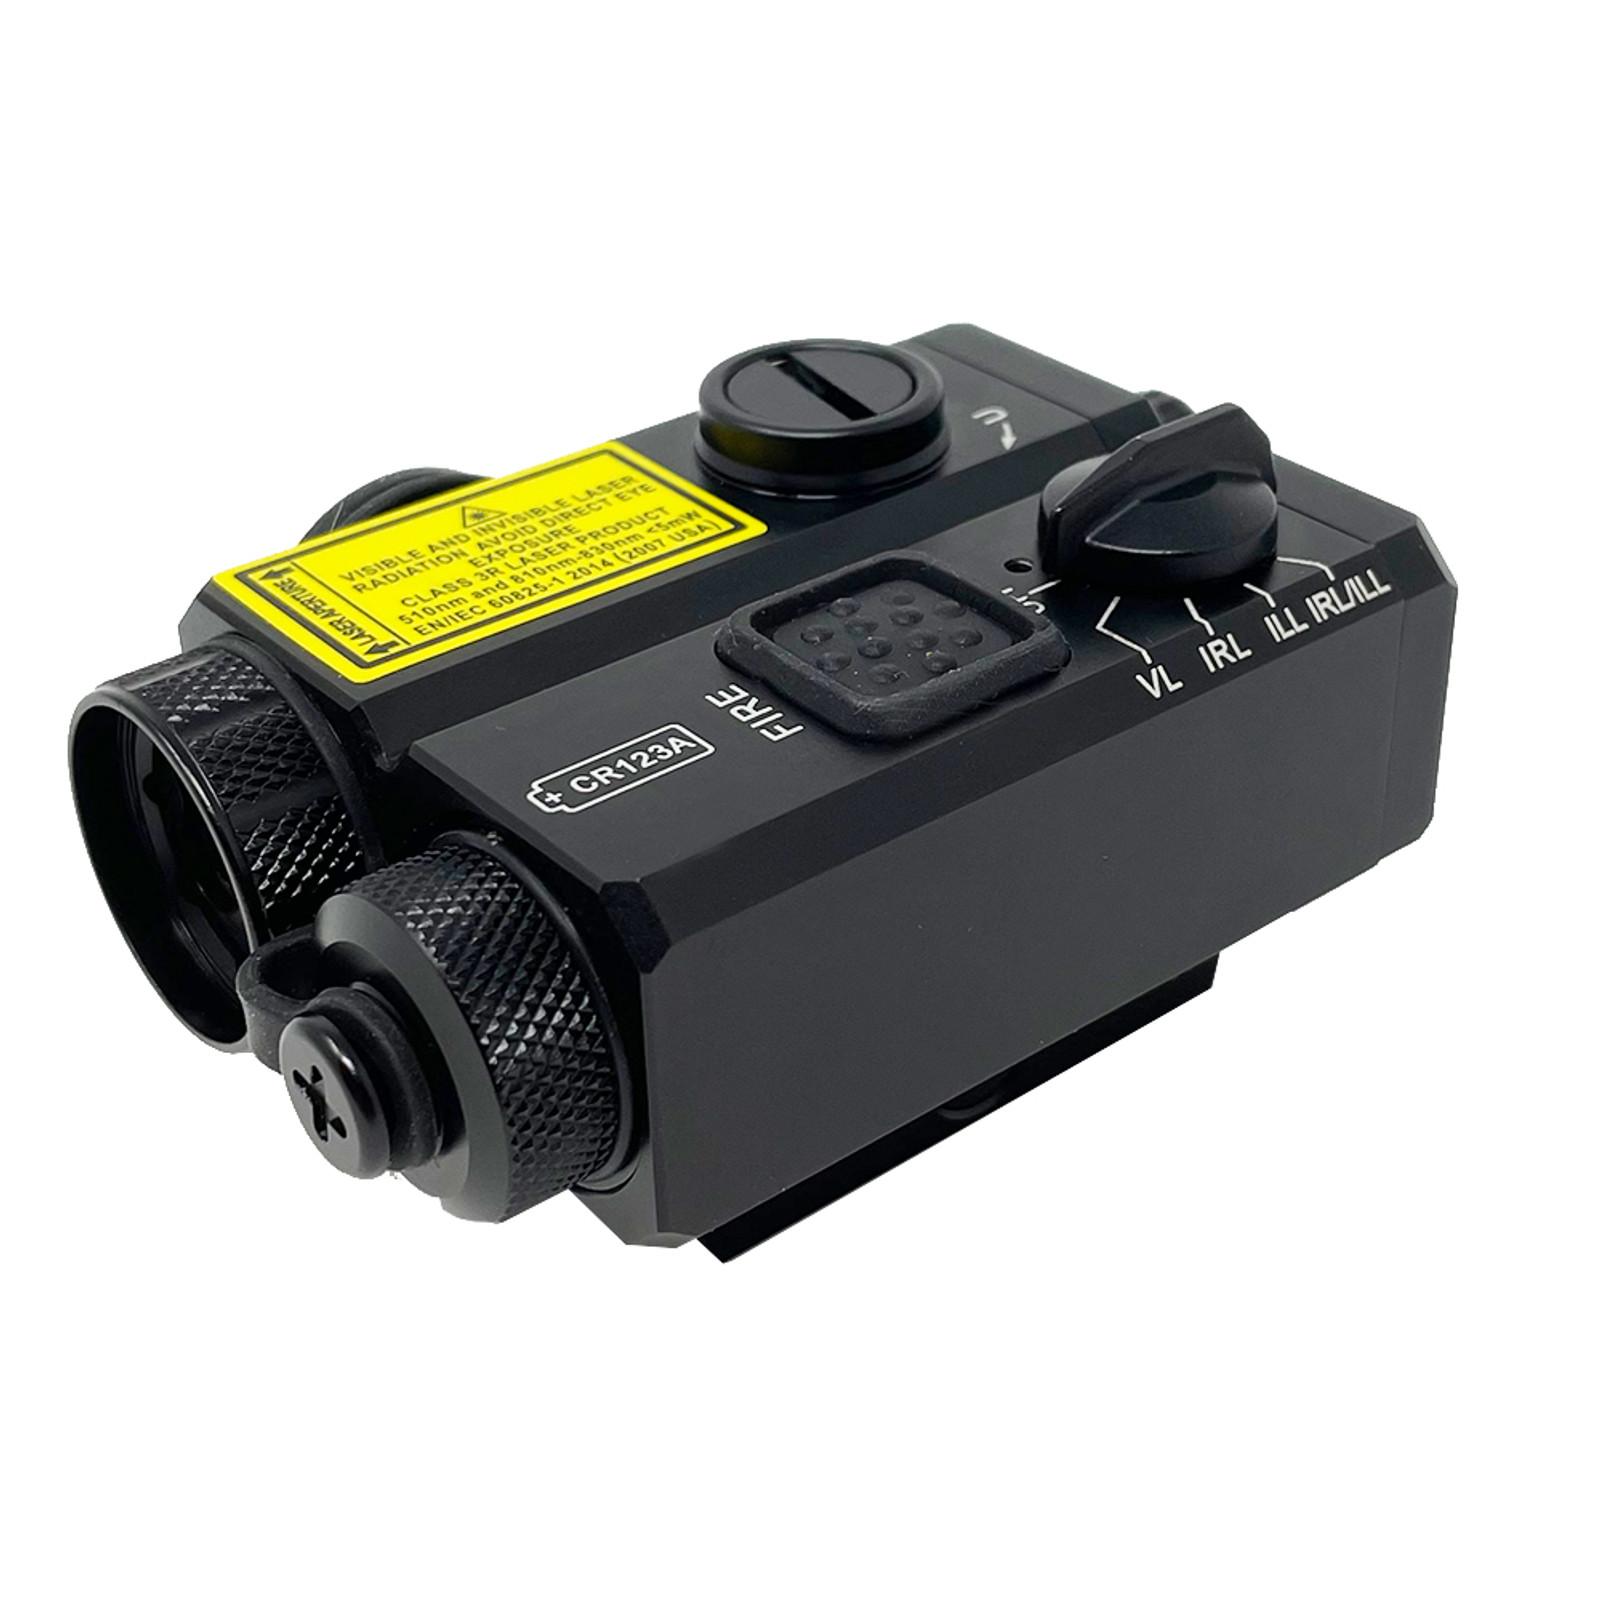 Triad™ C2 Visible Green Laser/IR Laser/IR Illuminator Eye Safe